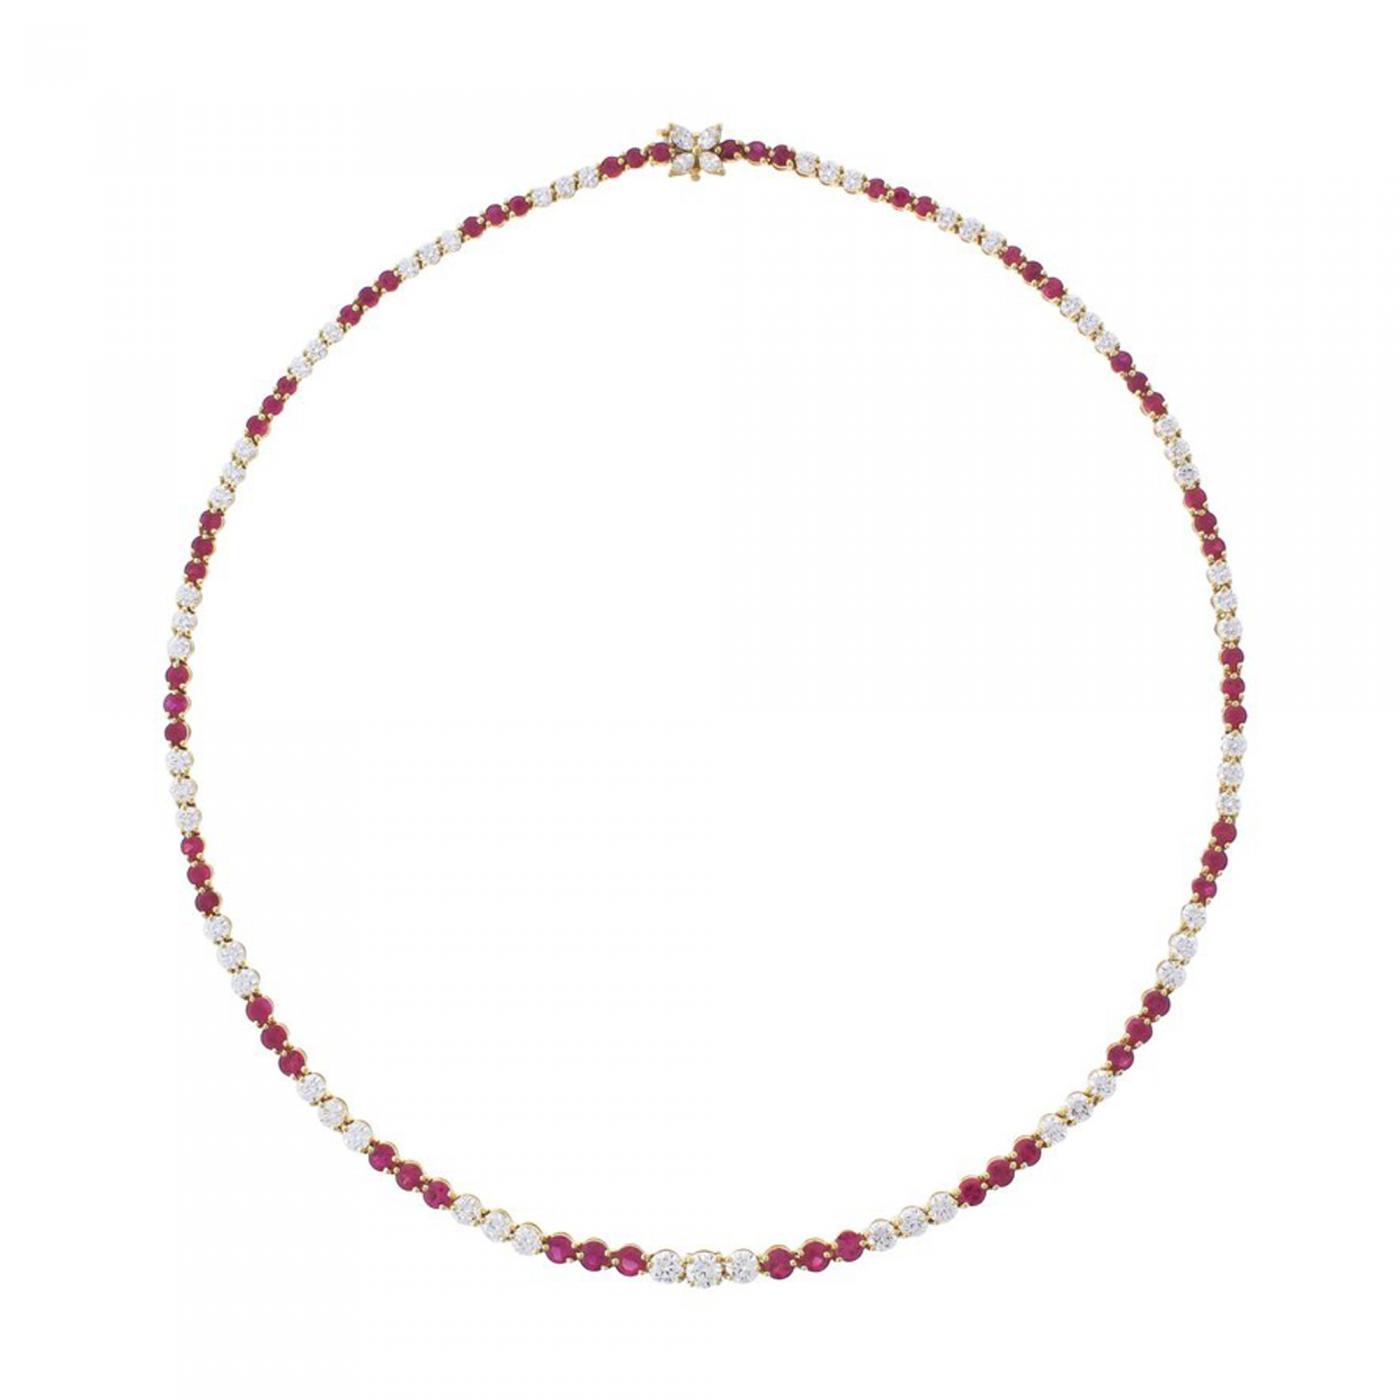 7390e3911 Tiffany and Co. - Tiffany & Co. Ruby and Diamond Victoria Necklace